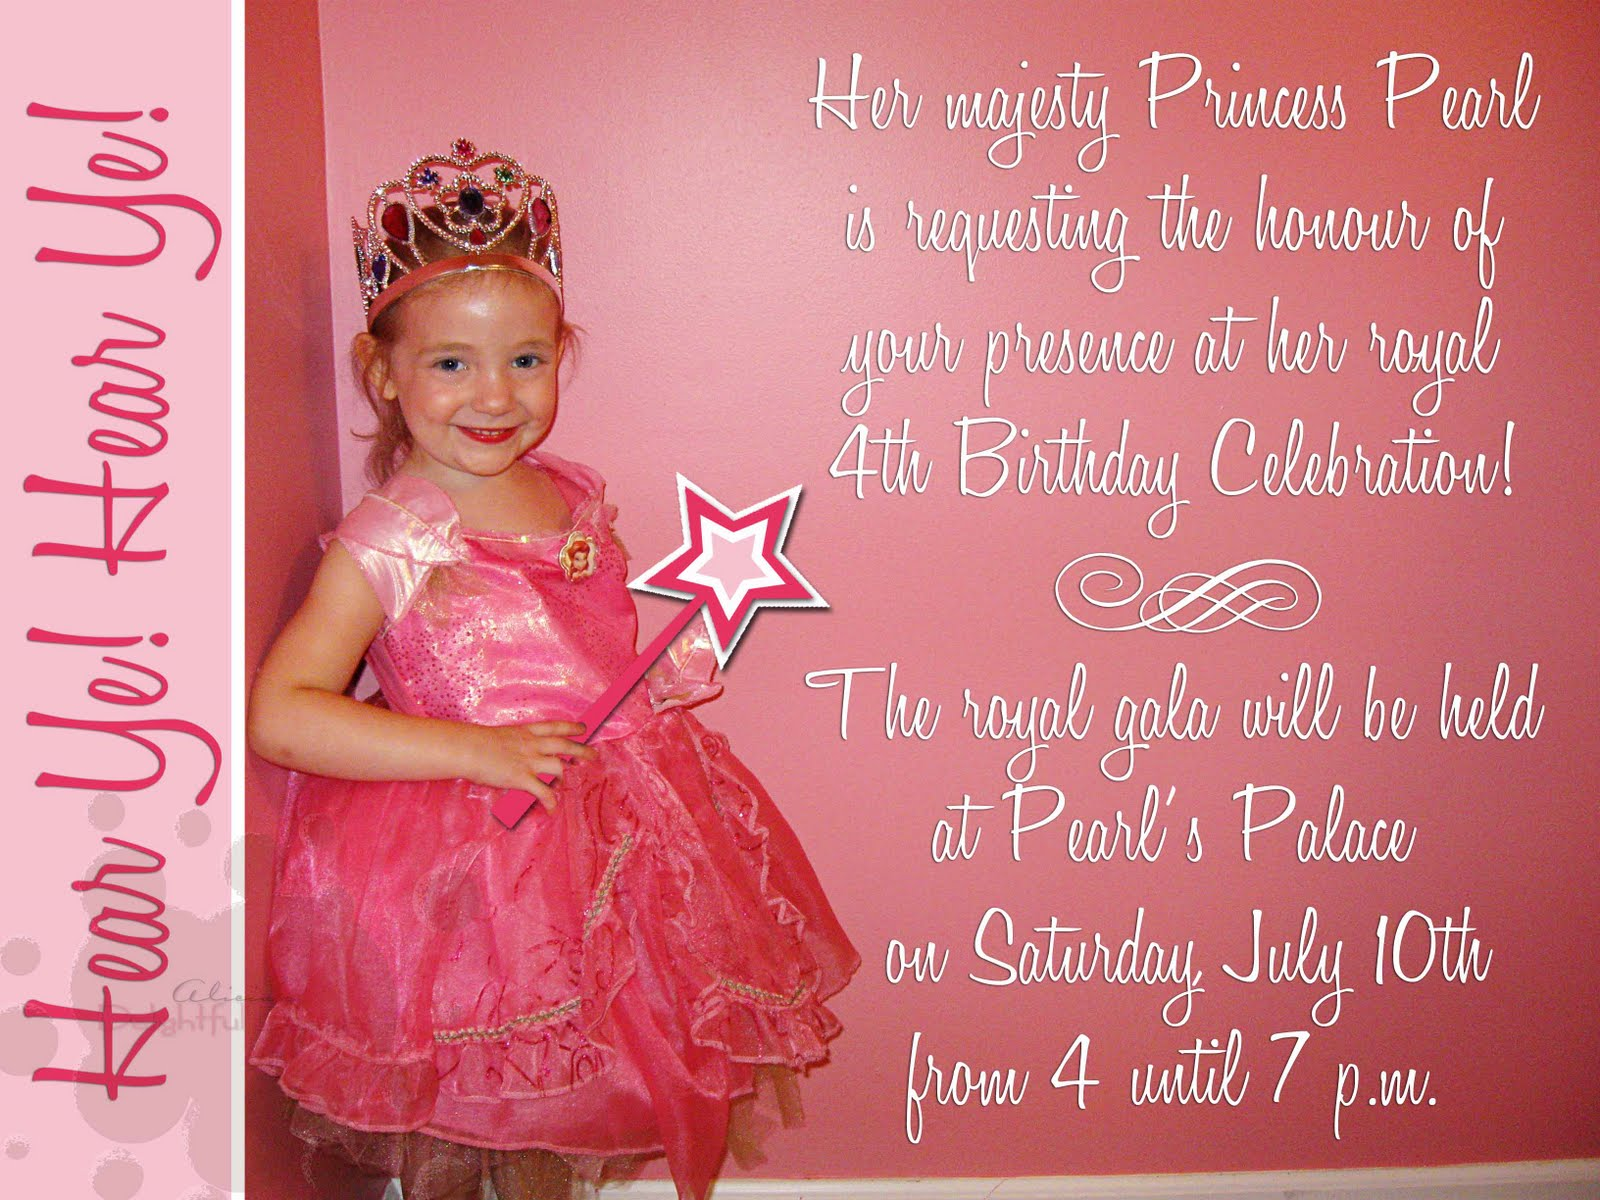 Birthday Invitation Card 7 Years Old – 7 Year Old Birthday Invitation Wording